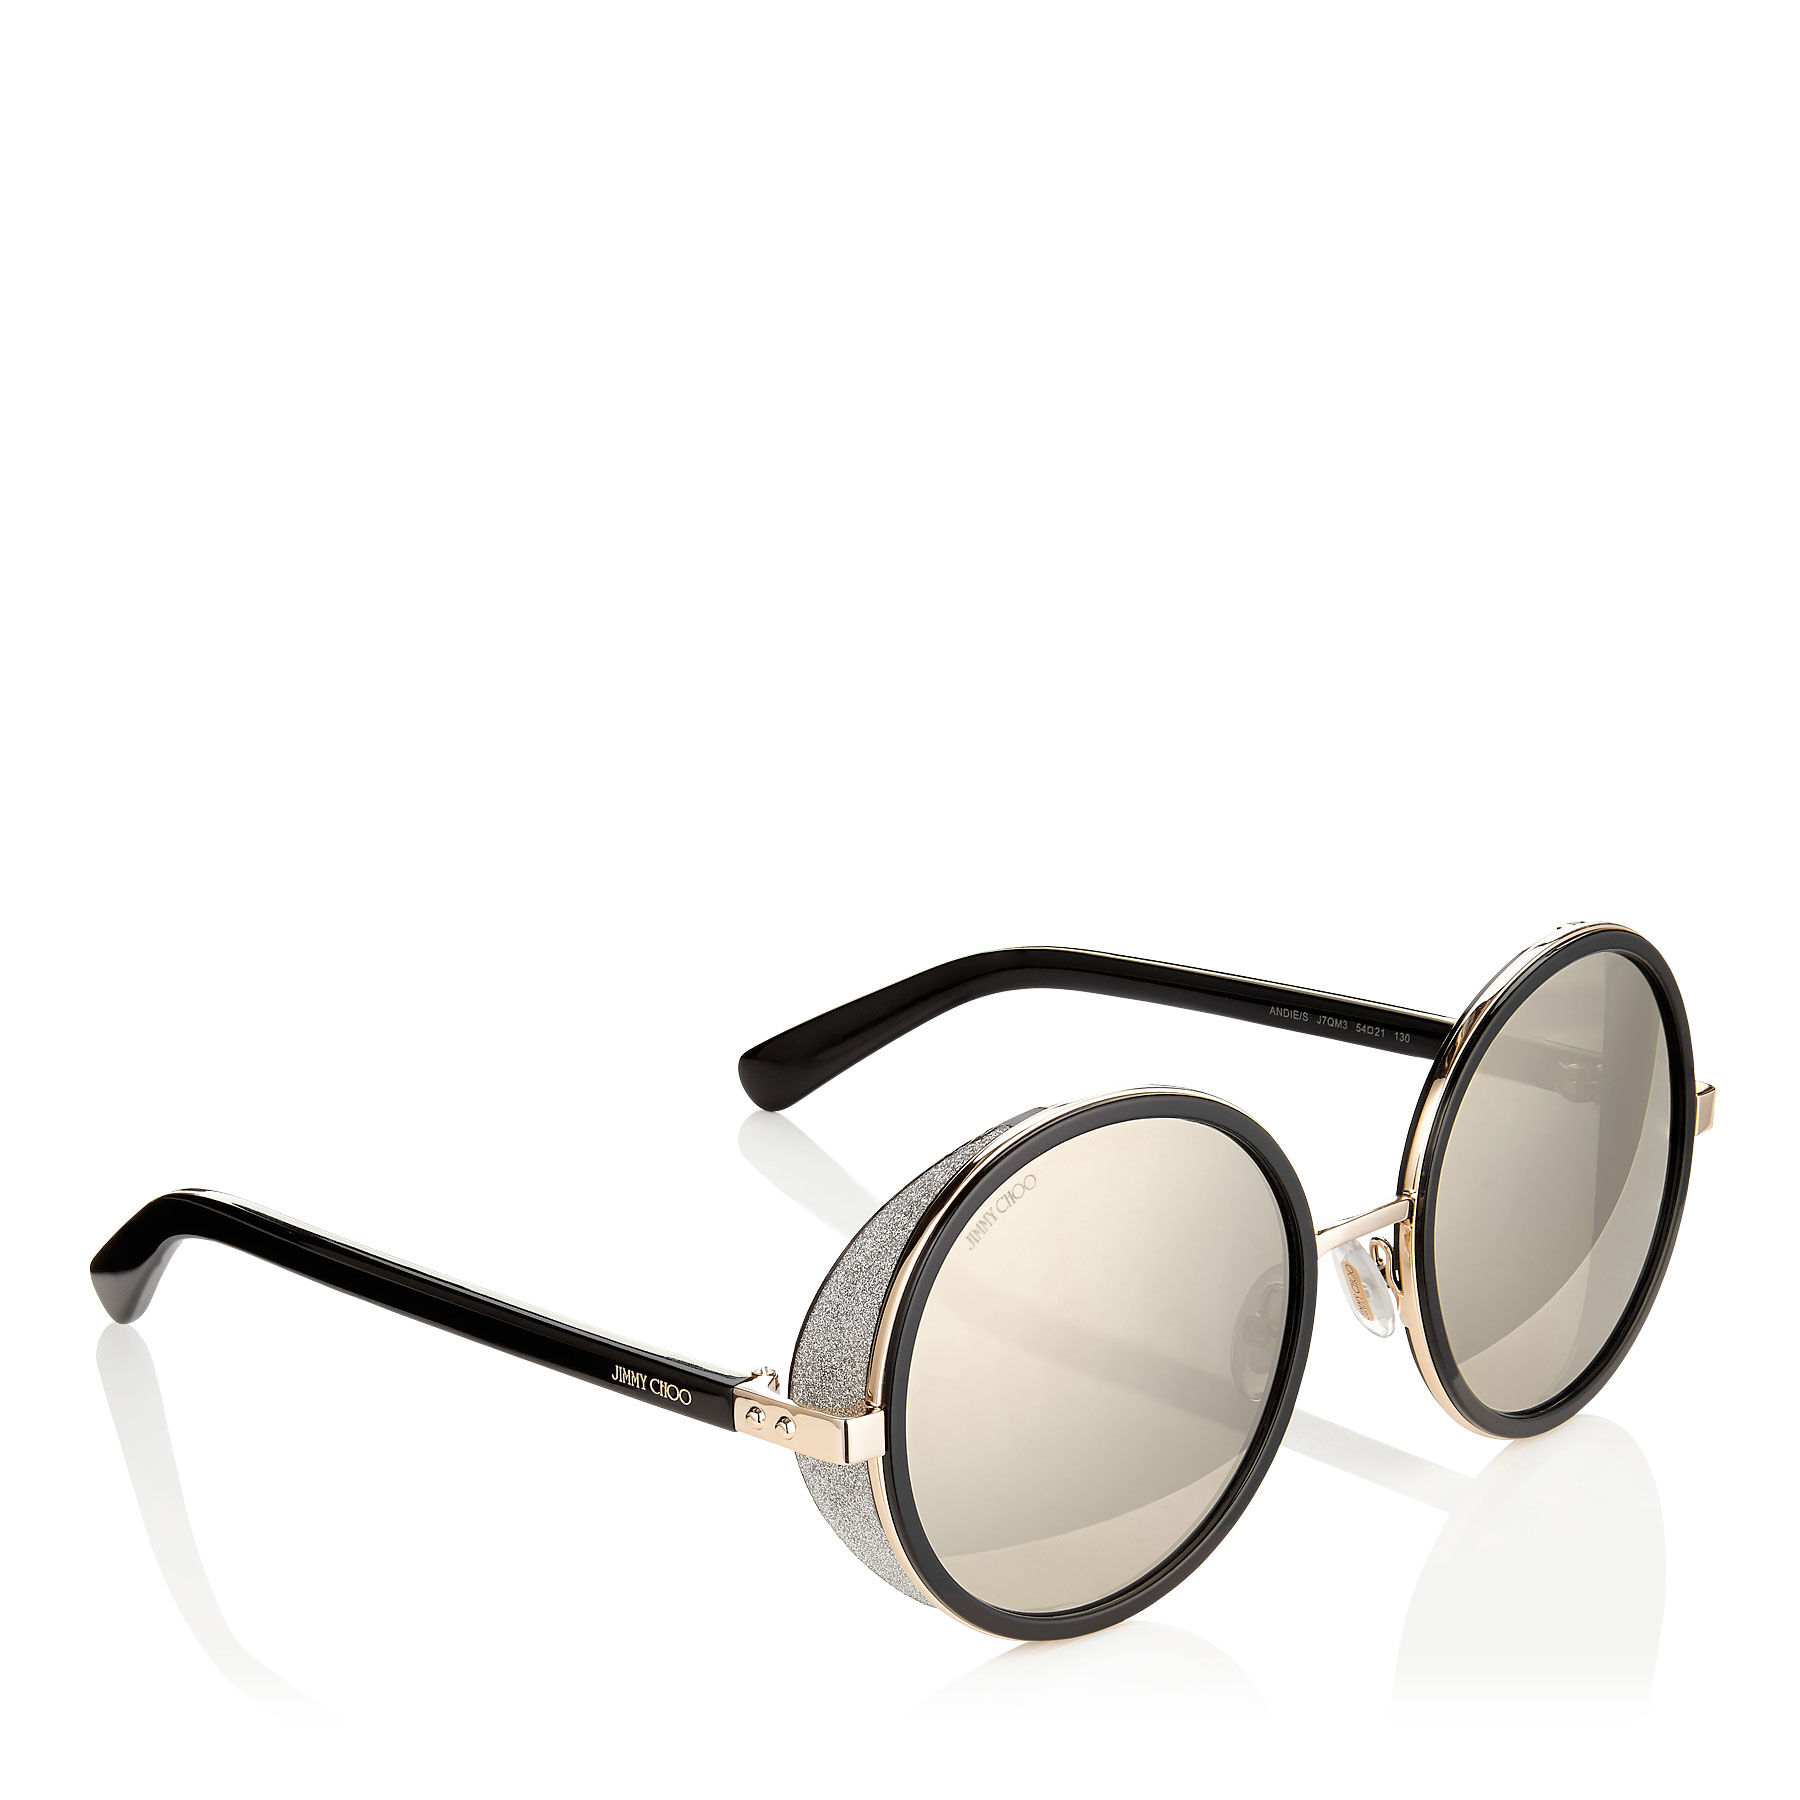 8dd273e30500 my jimmy choo glasses with glitter